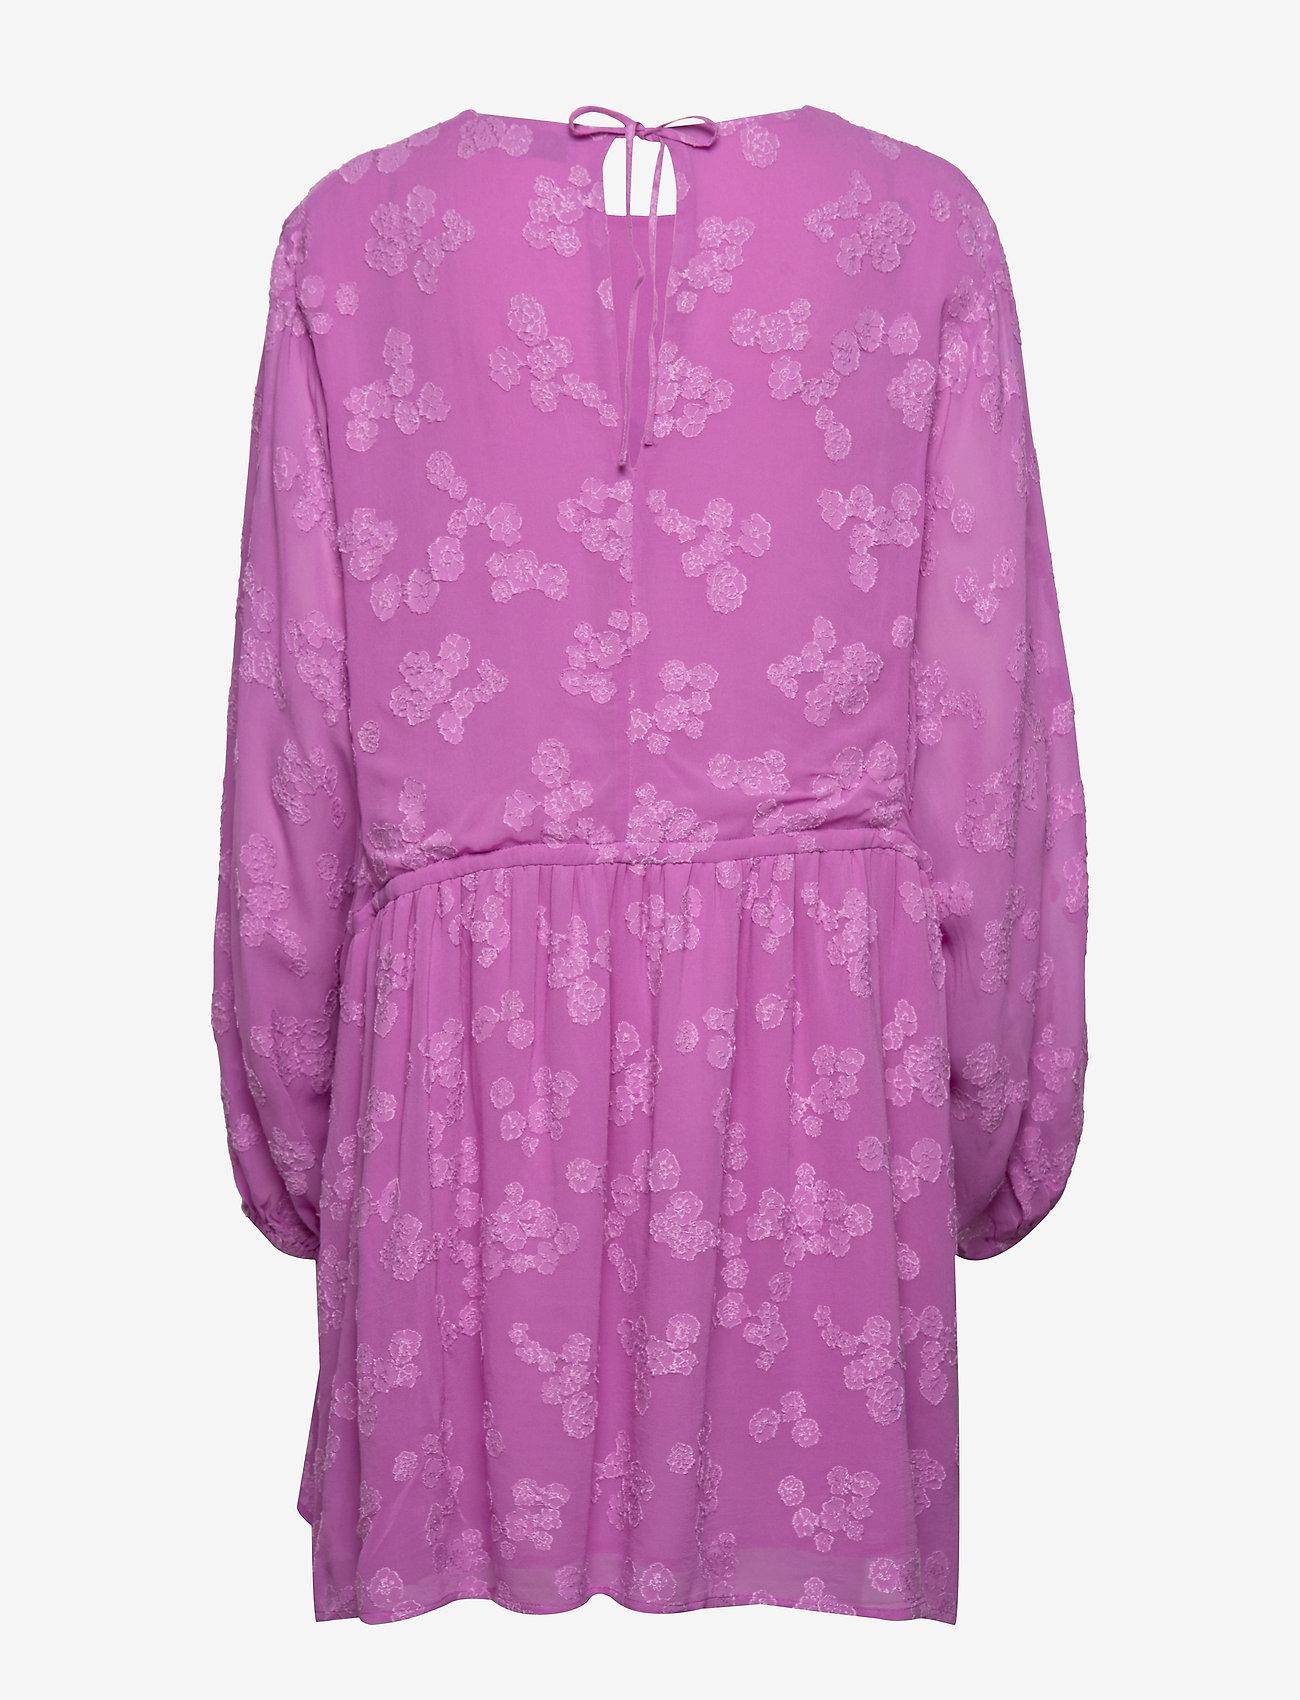 Enrose Ls Short Dress 6699 (Purple Coupe) - Envii NQx1aQ